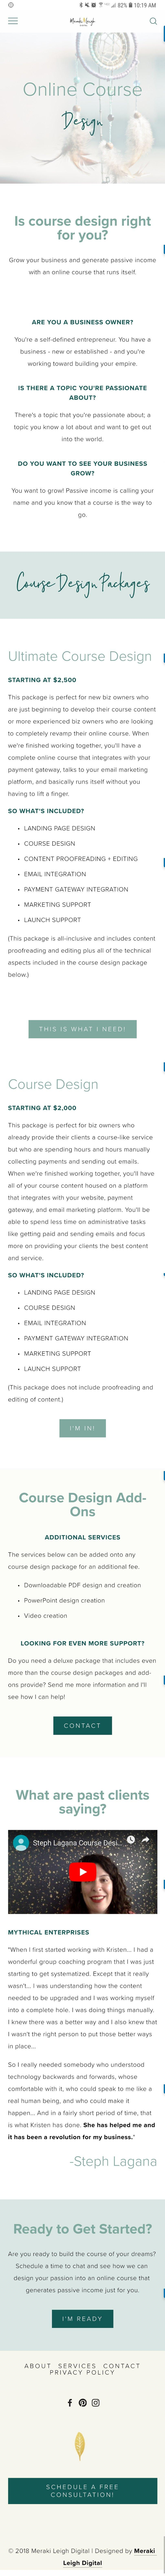 Kristen Leigh   WordPress Web Design Studio   Meraki Leigh Digital Portfolio Piece   Online Course Design Page on Mobile